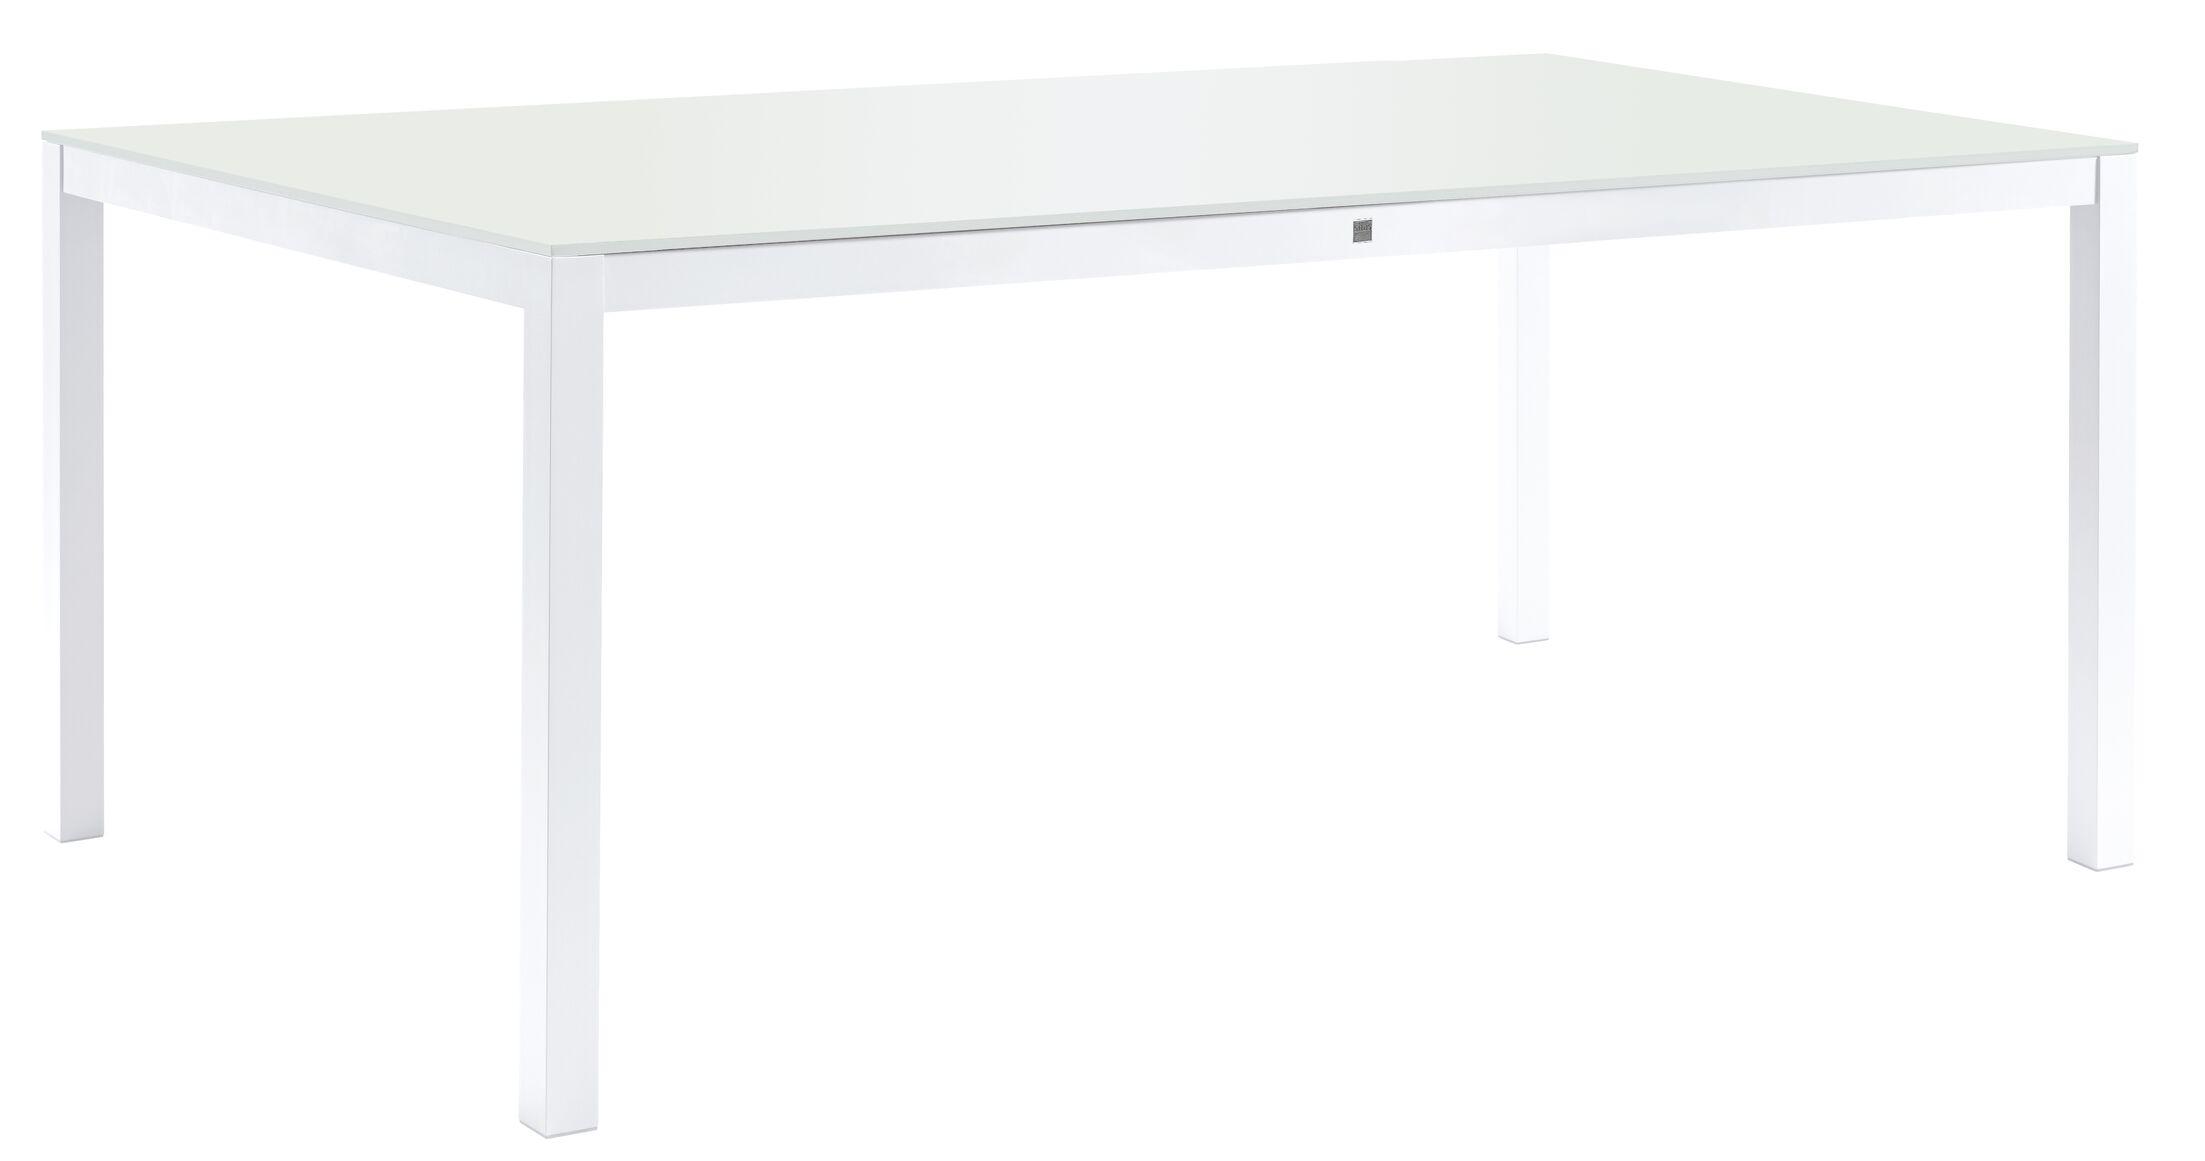 Santistevan Dining Table Table Size: 94.5